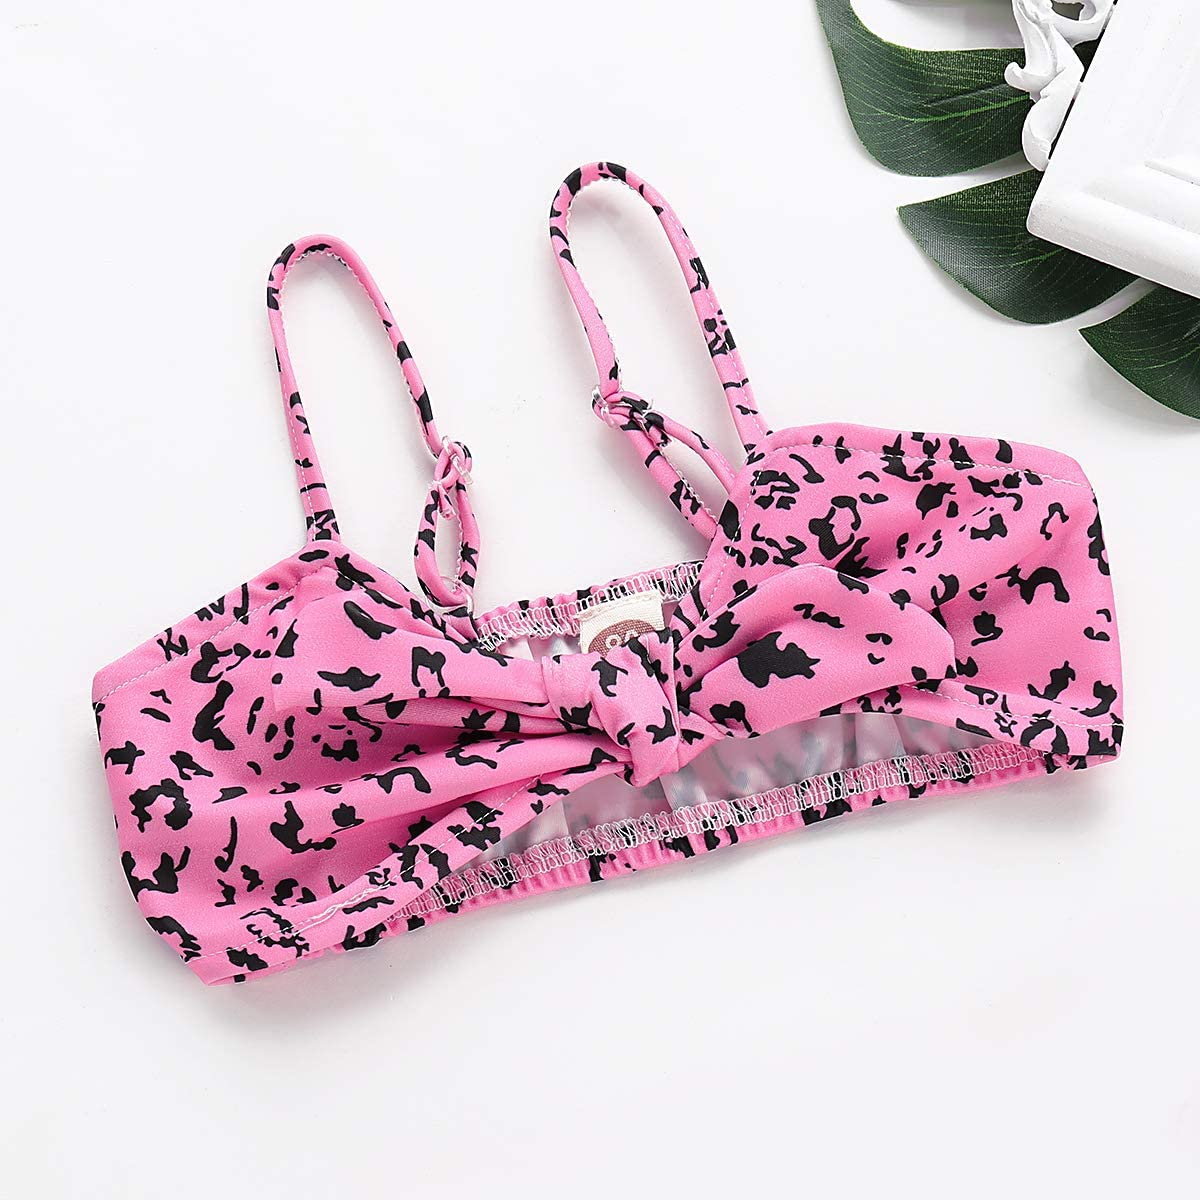 Minseng Direct Toddler Bowknot Swimsuit Leopard Print Little Girls Outfit Set